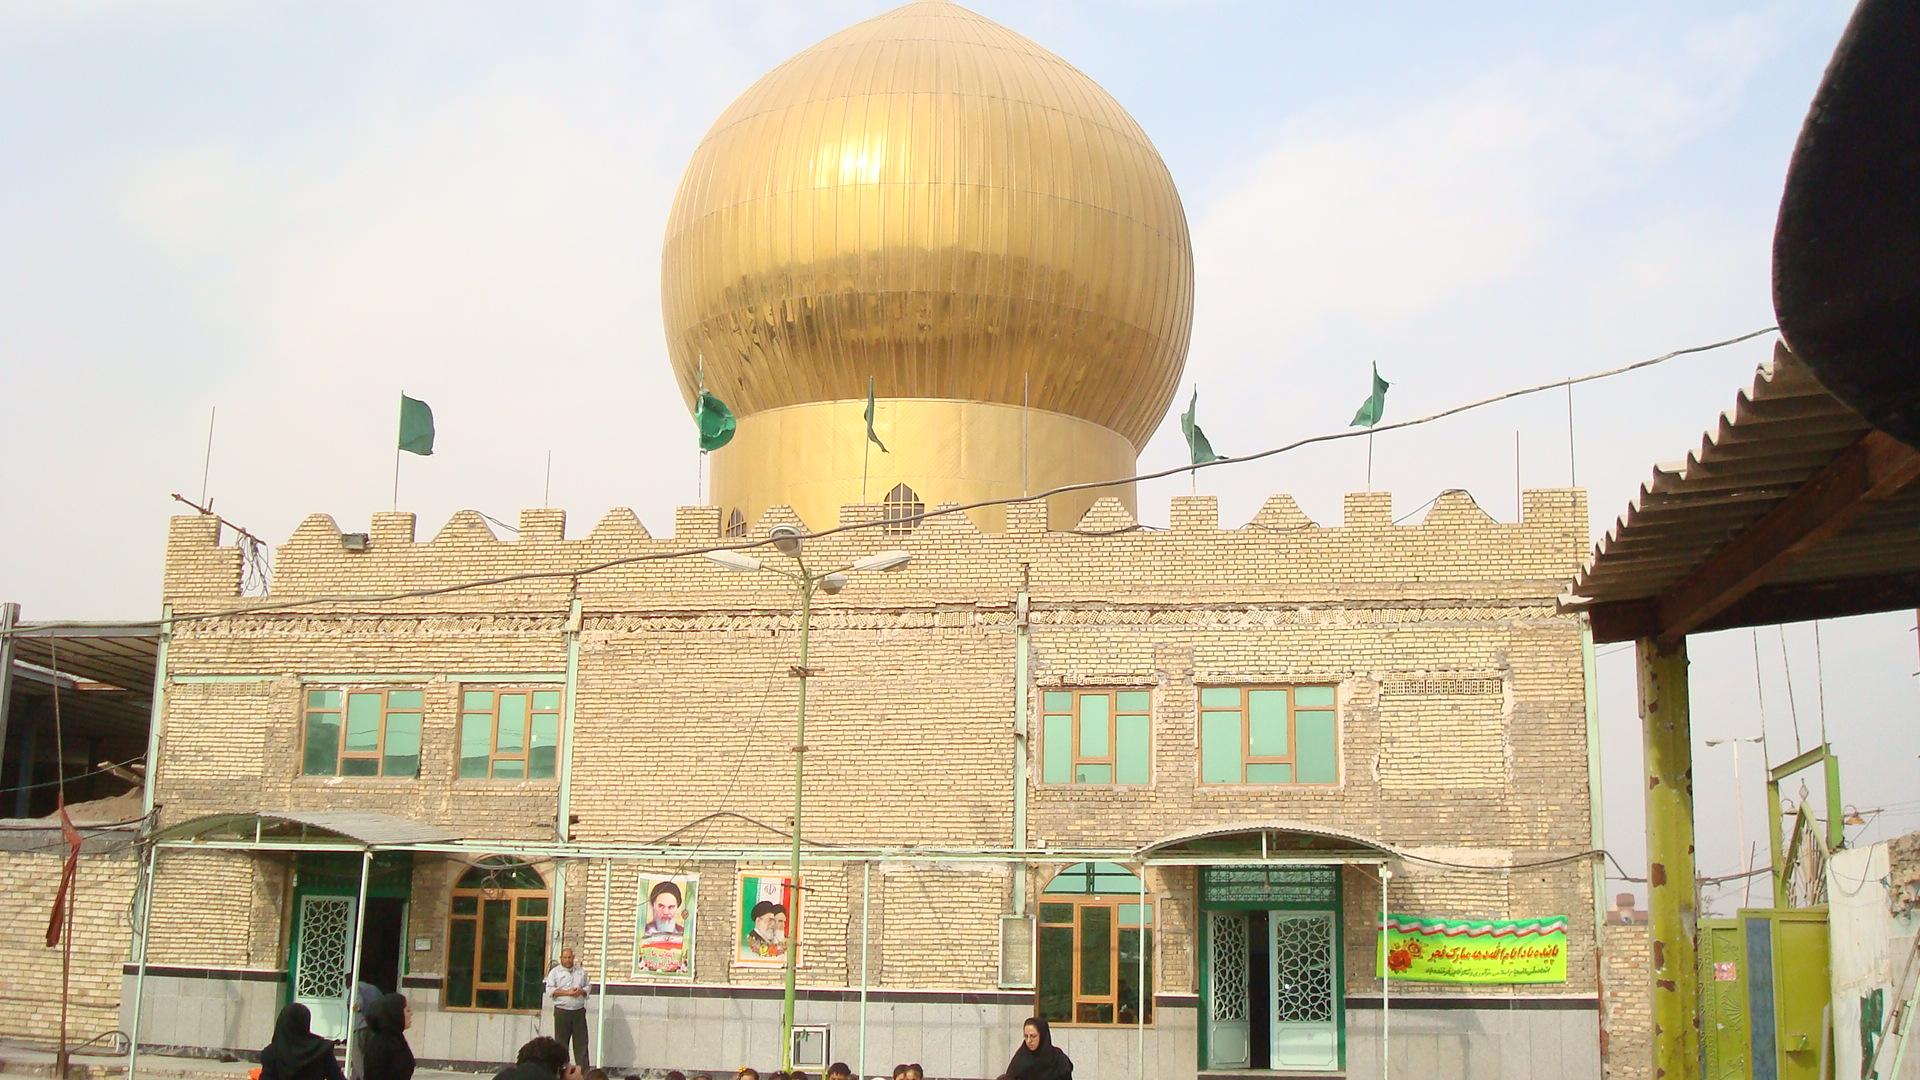 sed abas 2 - بهترین مکان های دیدنی آبادان | خوزستان